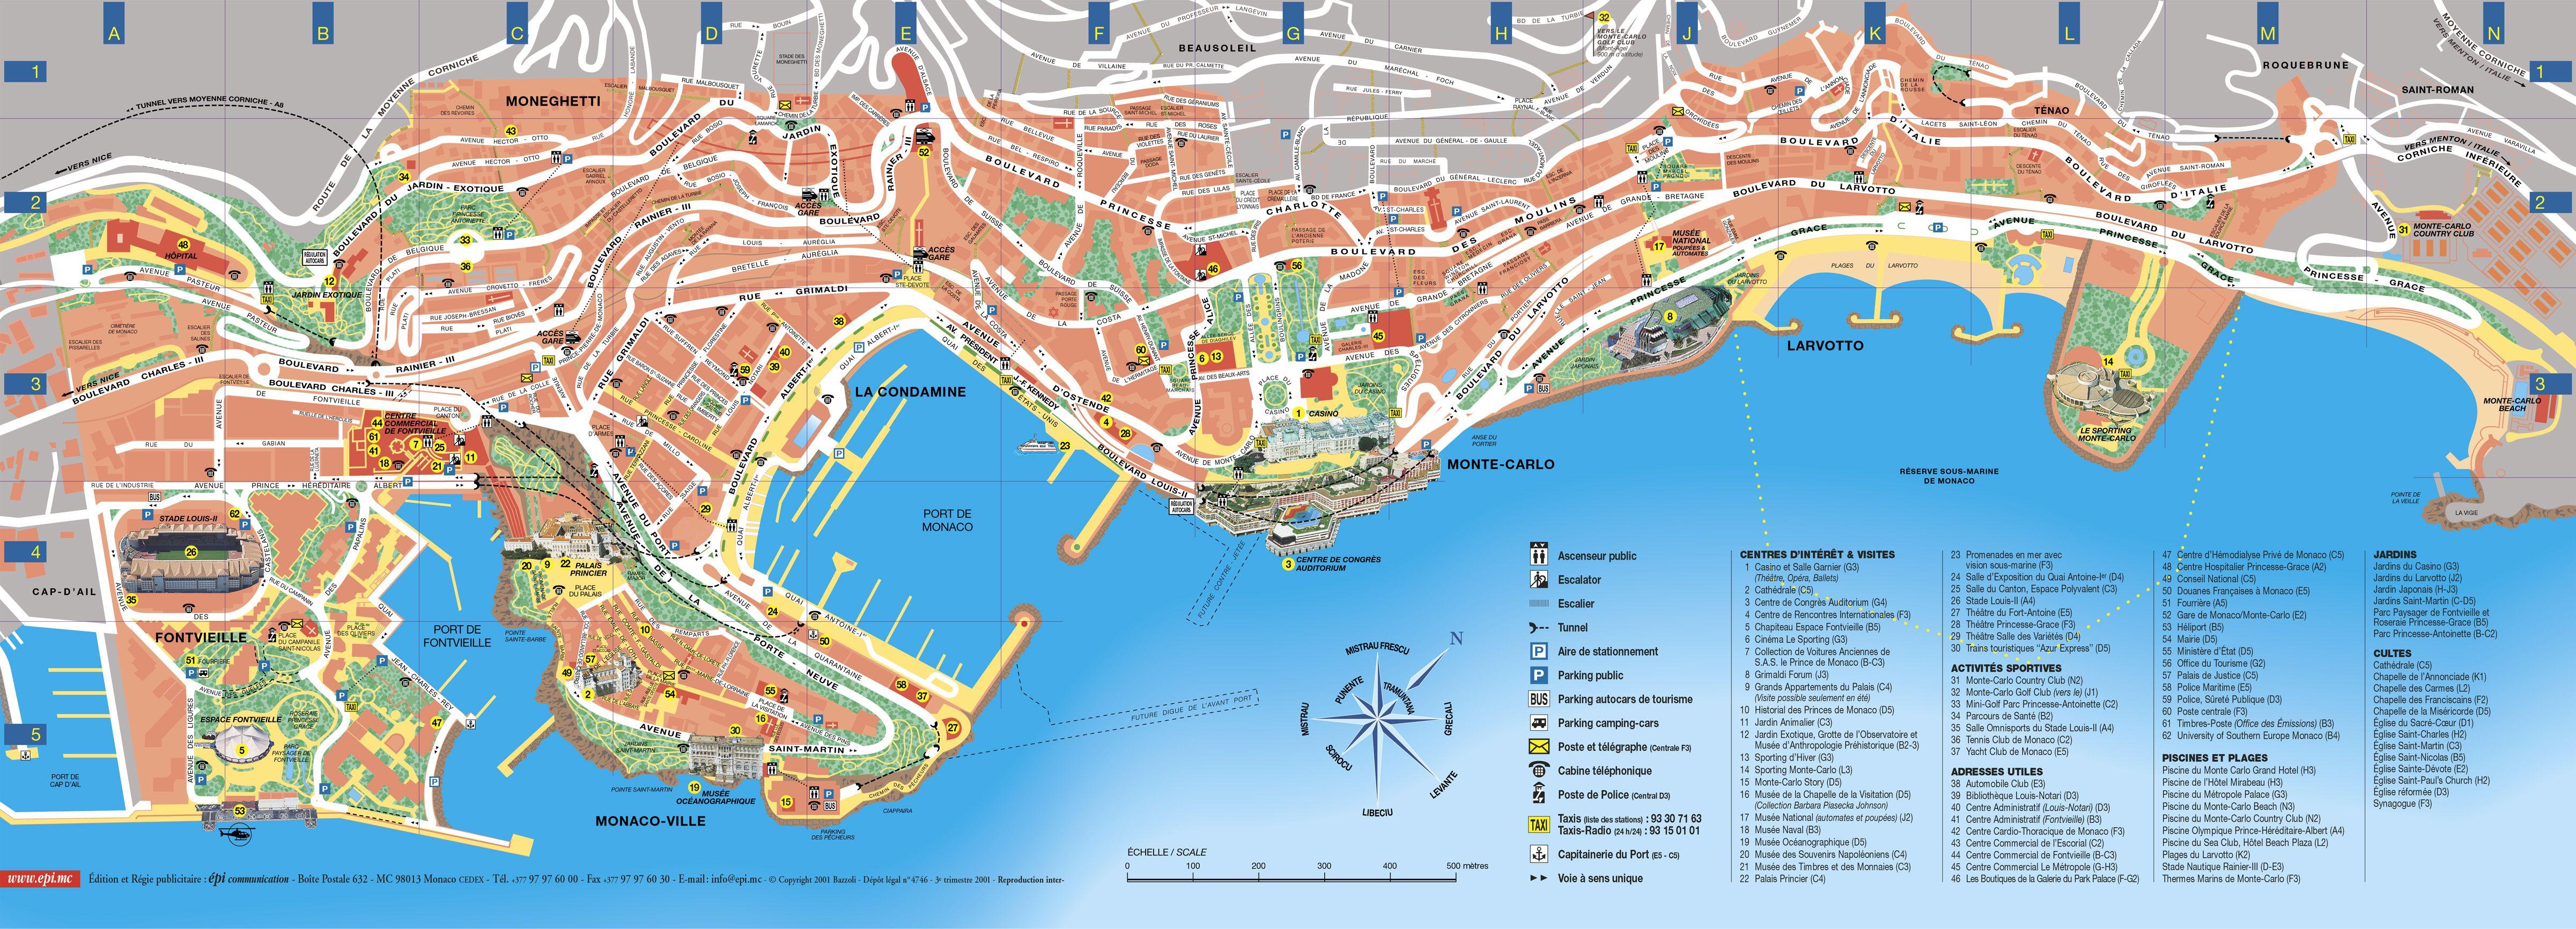 Monaco Italien Karte.Monaco Tourist Map Monaco Mappery Research For Chasing